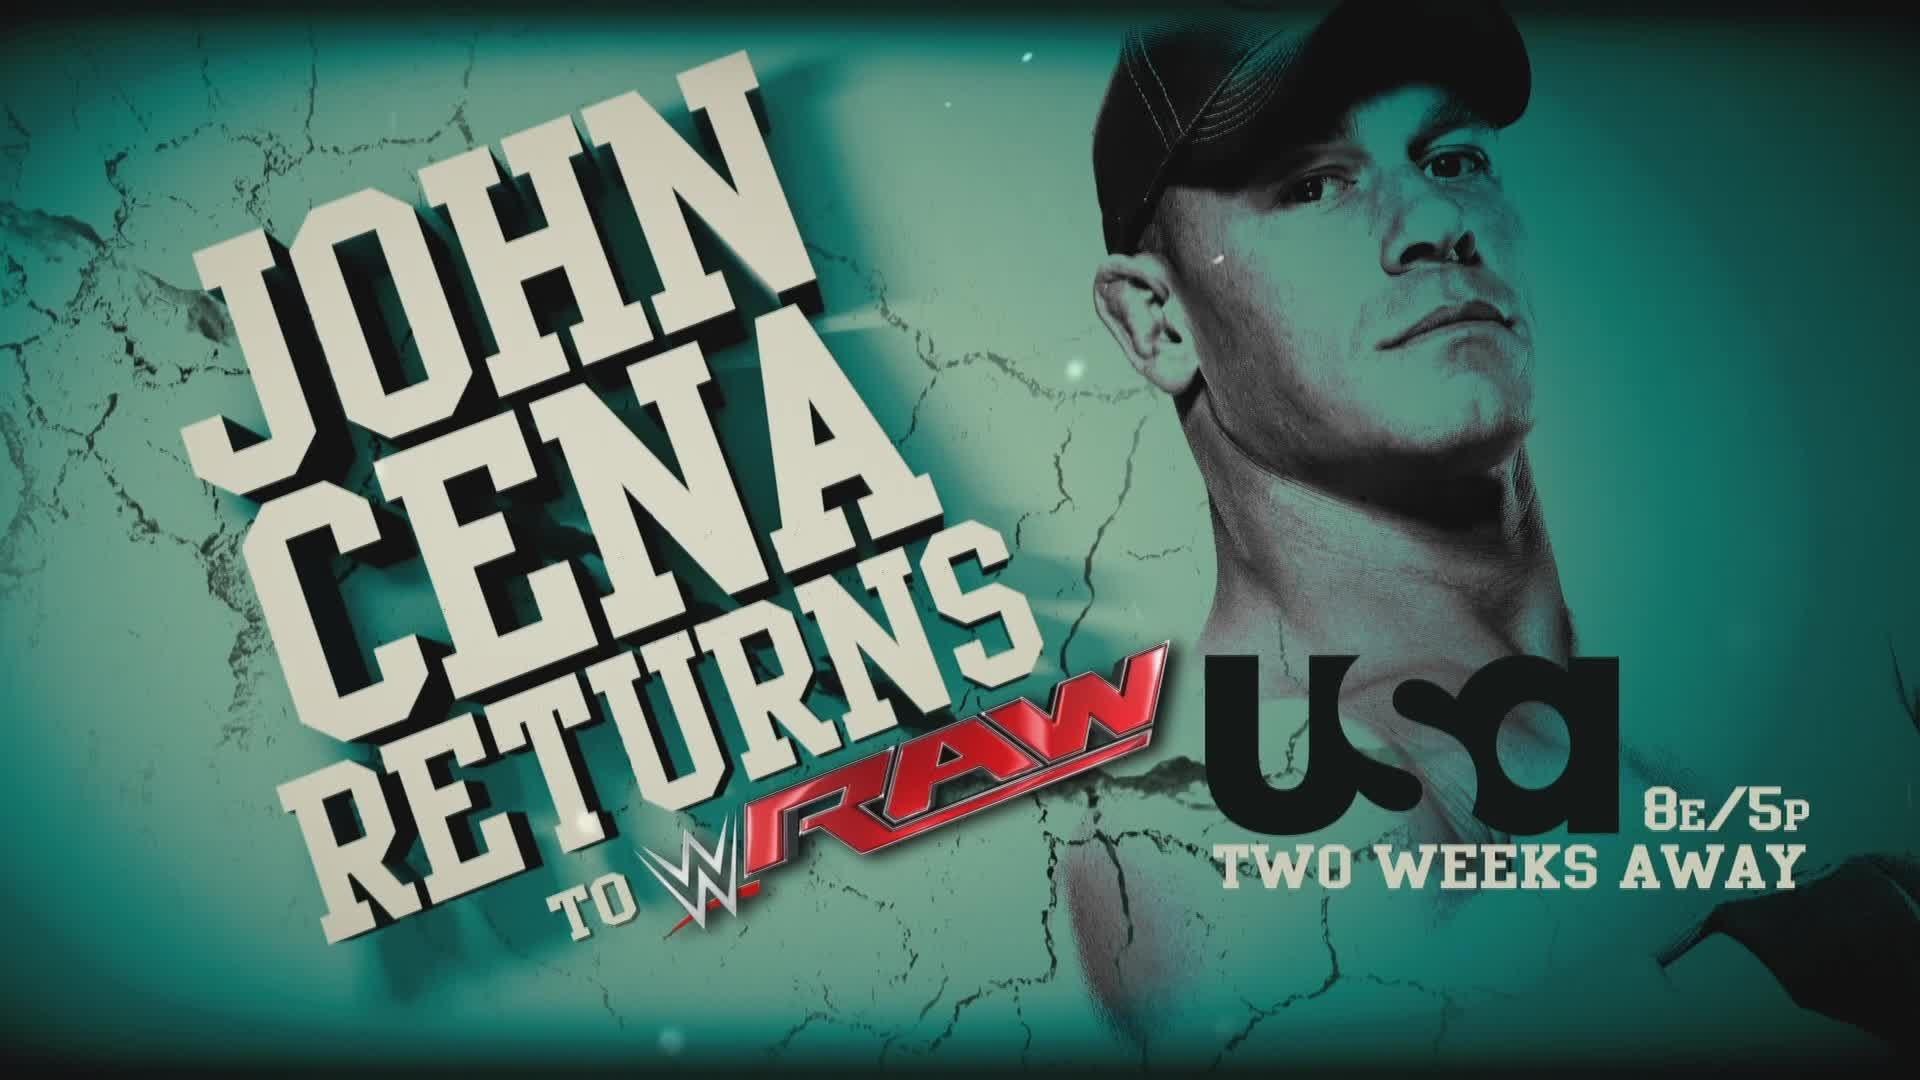 WWE star John Cena named host of the 2016 ESPYs